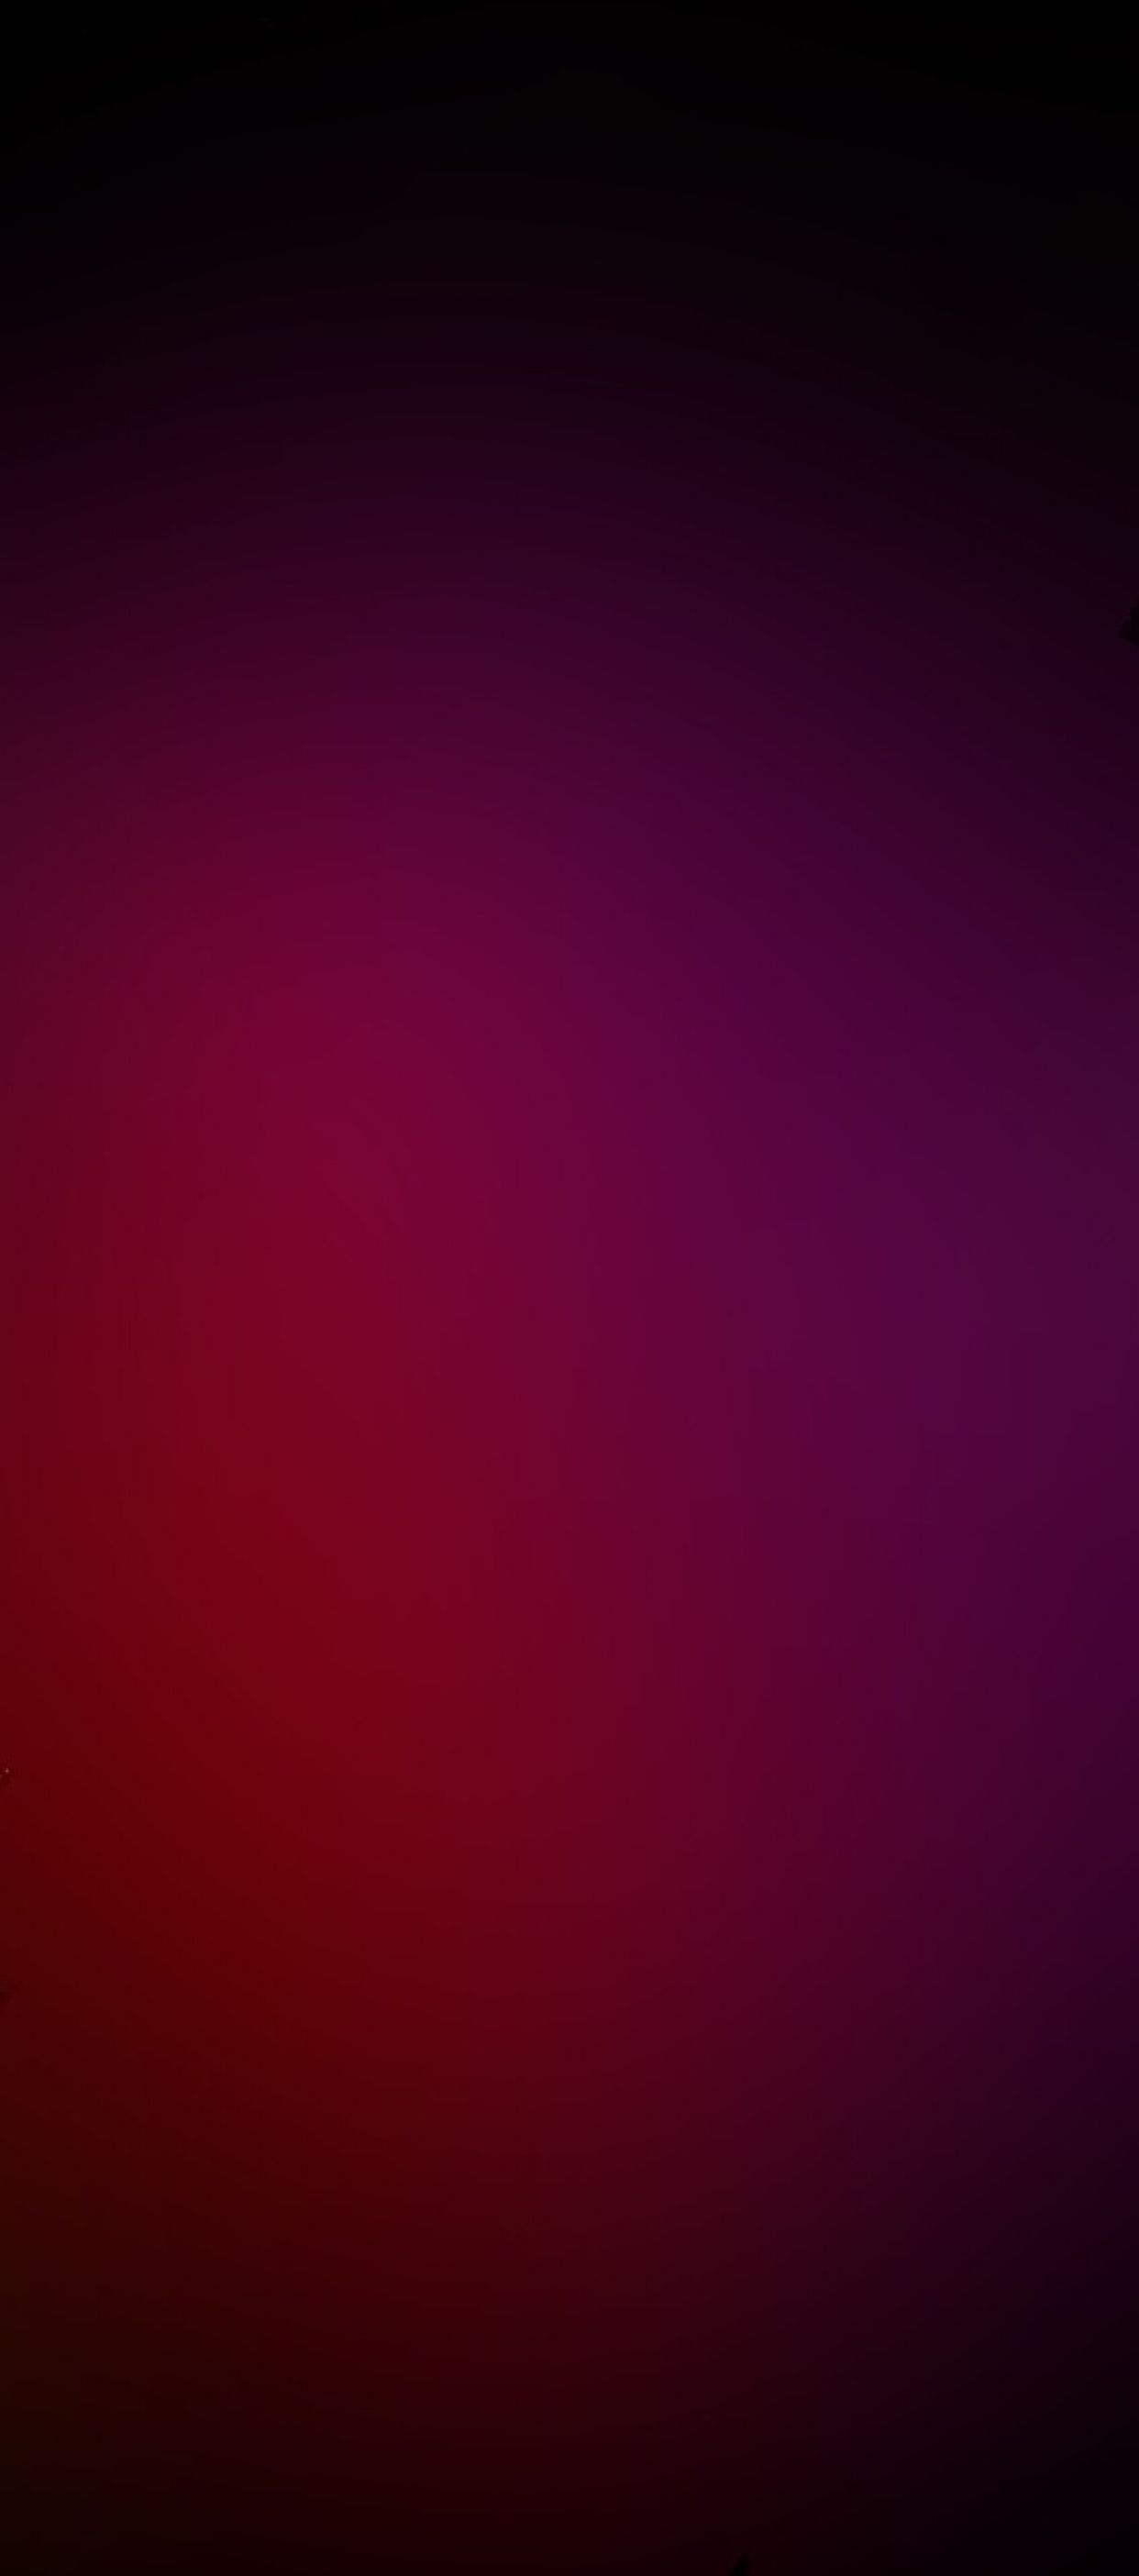 Samsung Galaxy Red Wallpaper